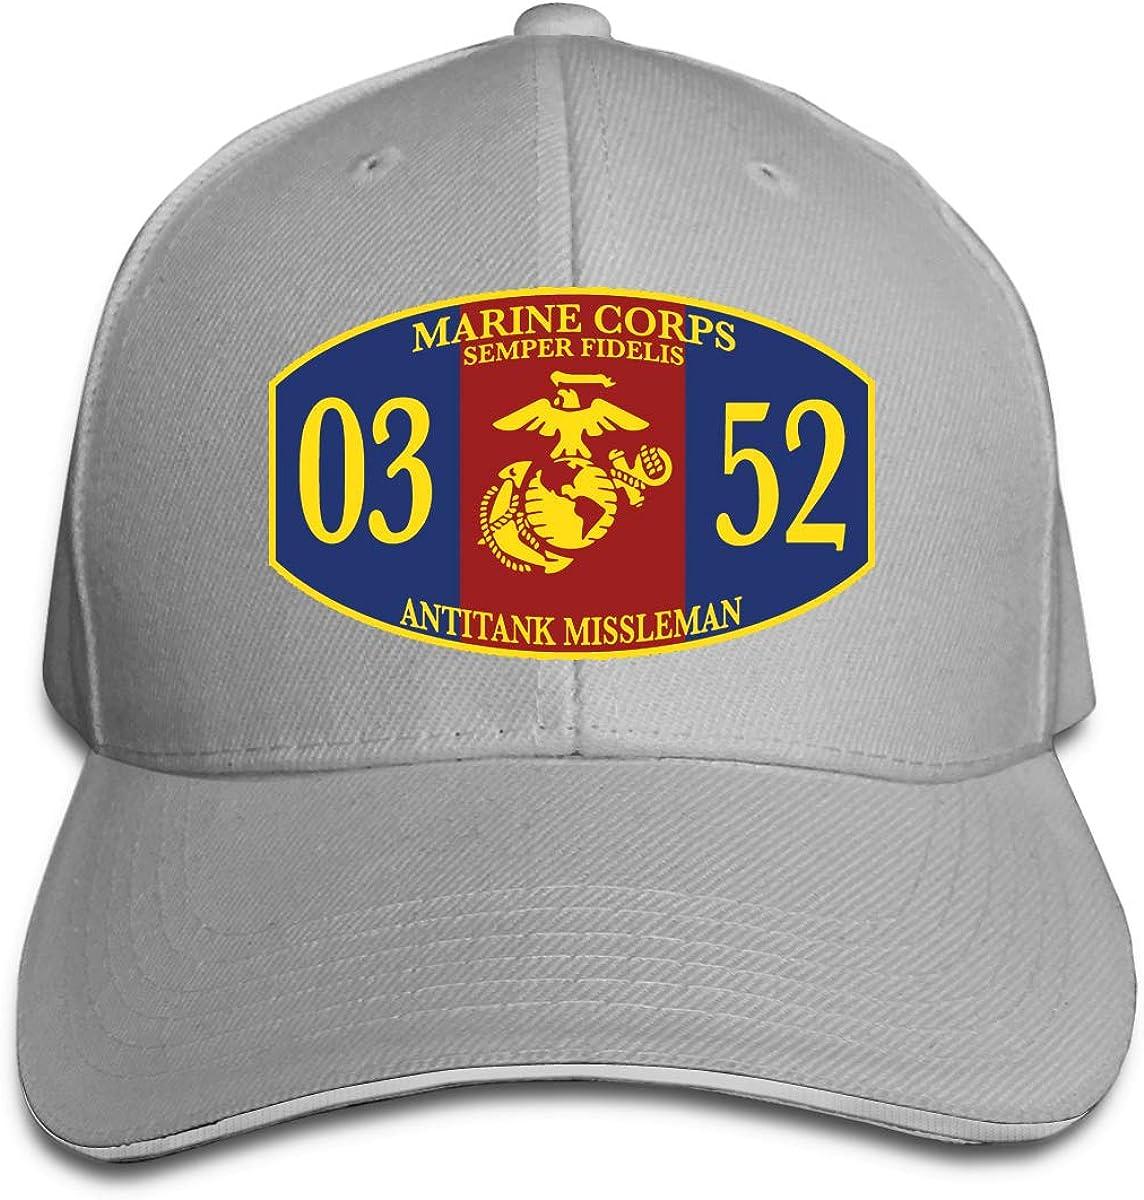 Unisex Athletic Baseball Fitted Cap TAKA Mortarman 0352 MOS Marine